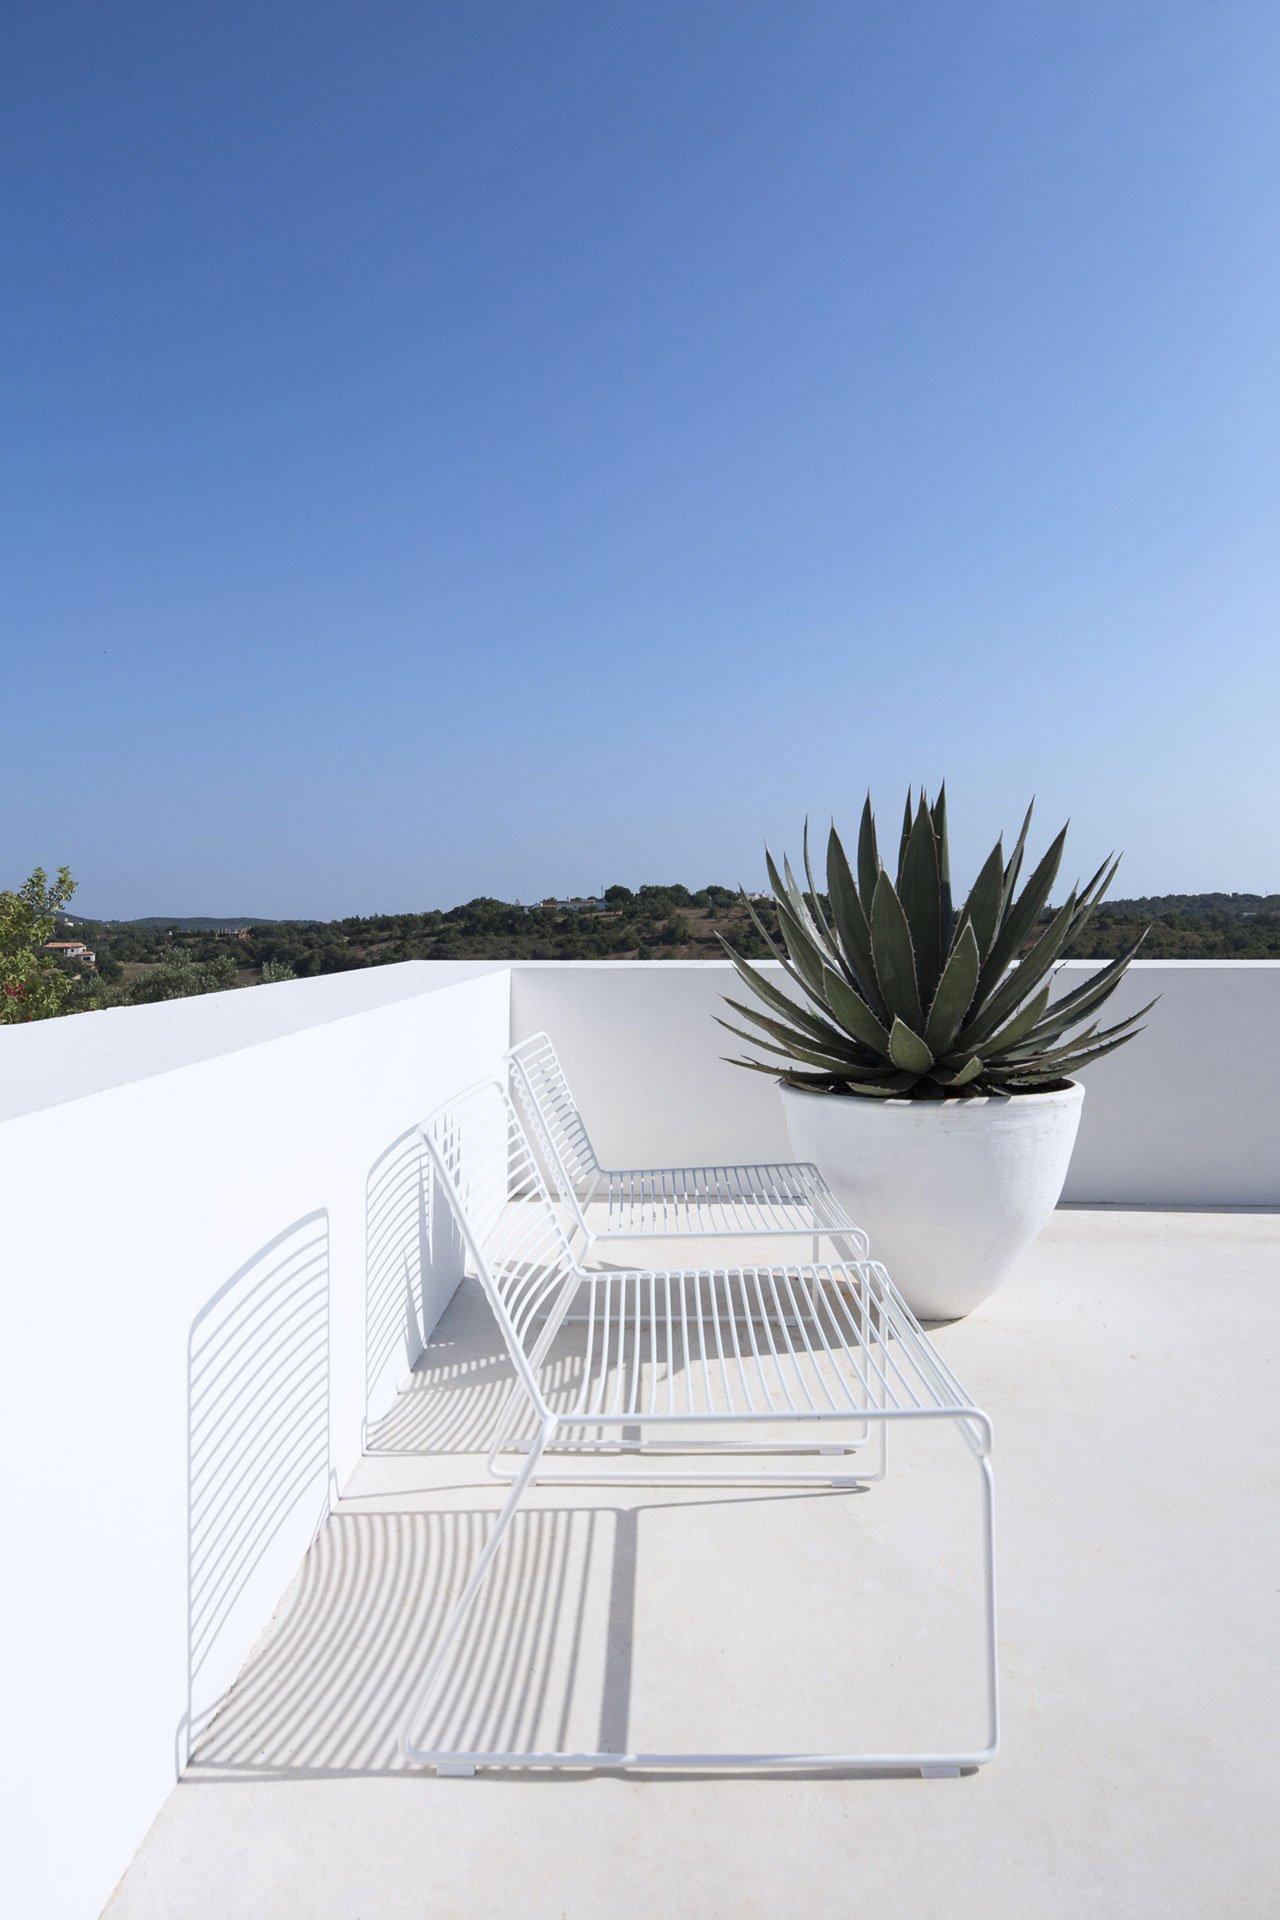 casa-luum-minimalizmus-a-portugal-videken-noko-015.jpg